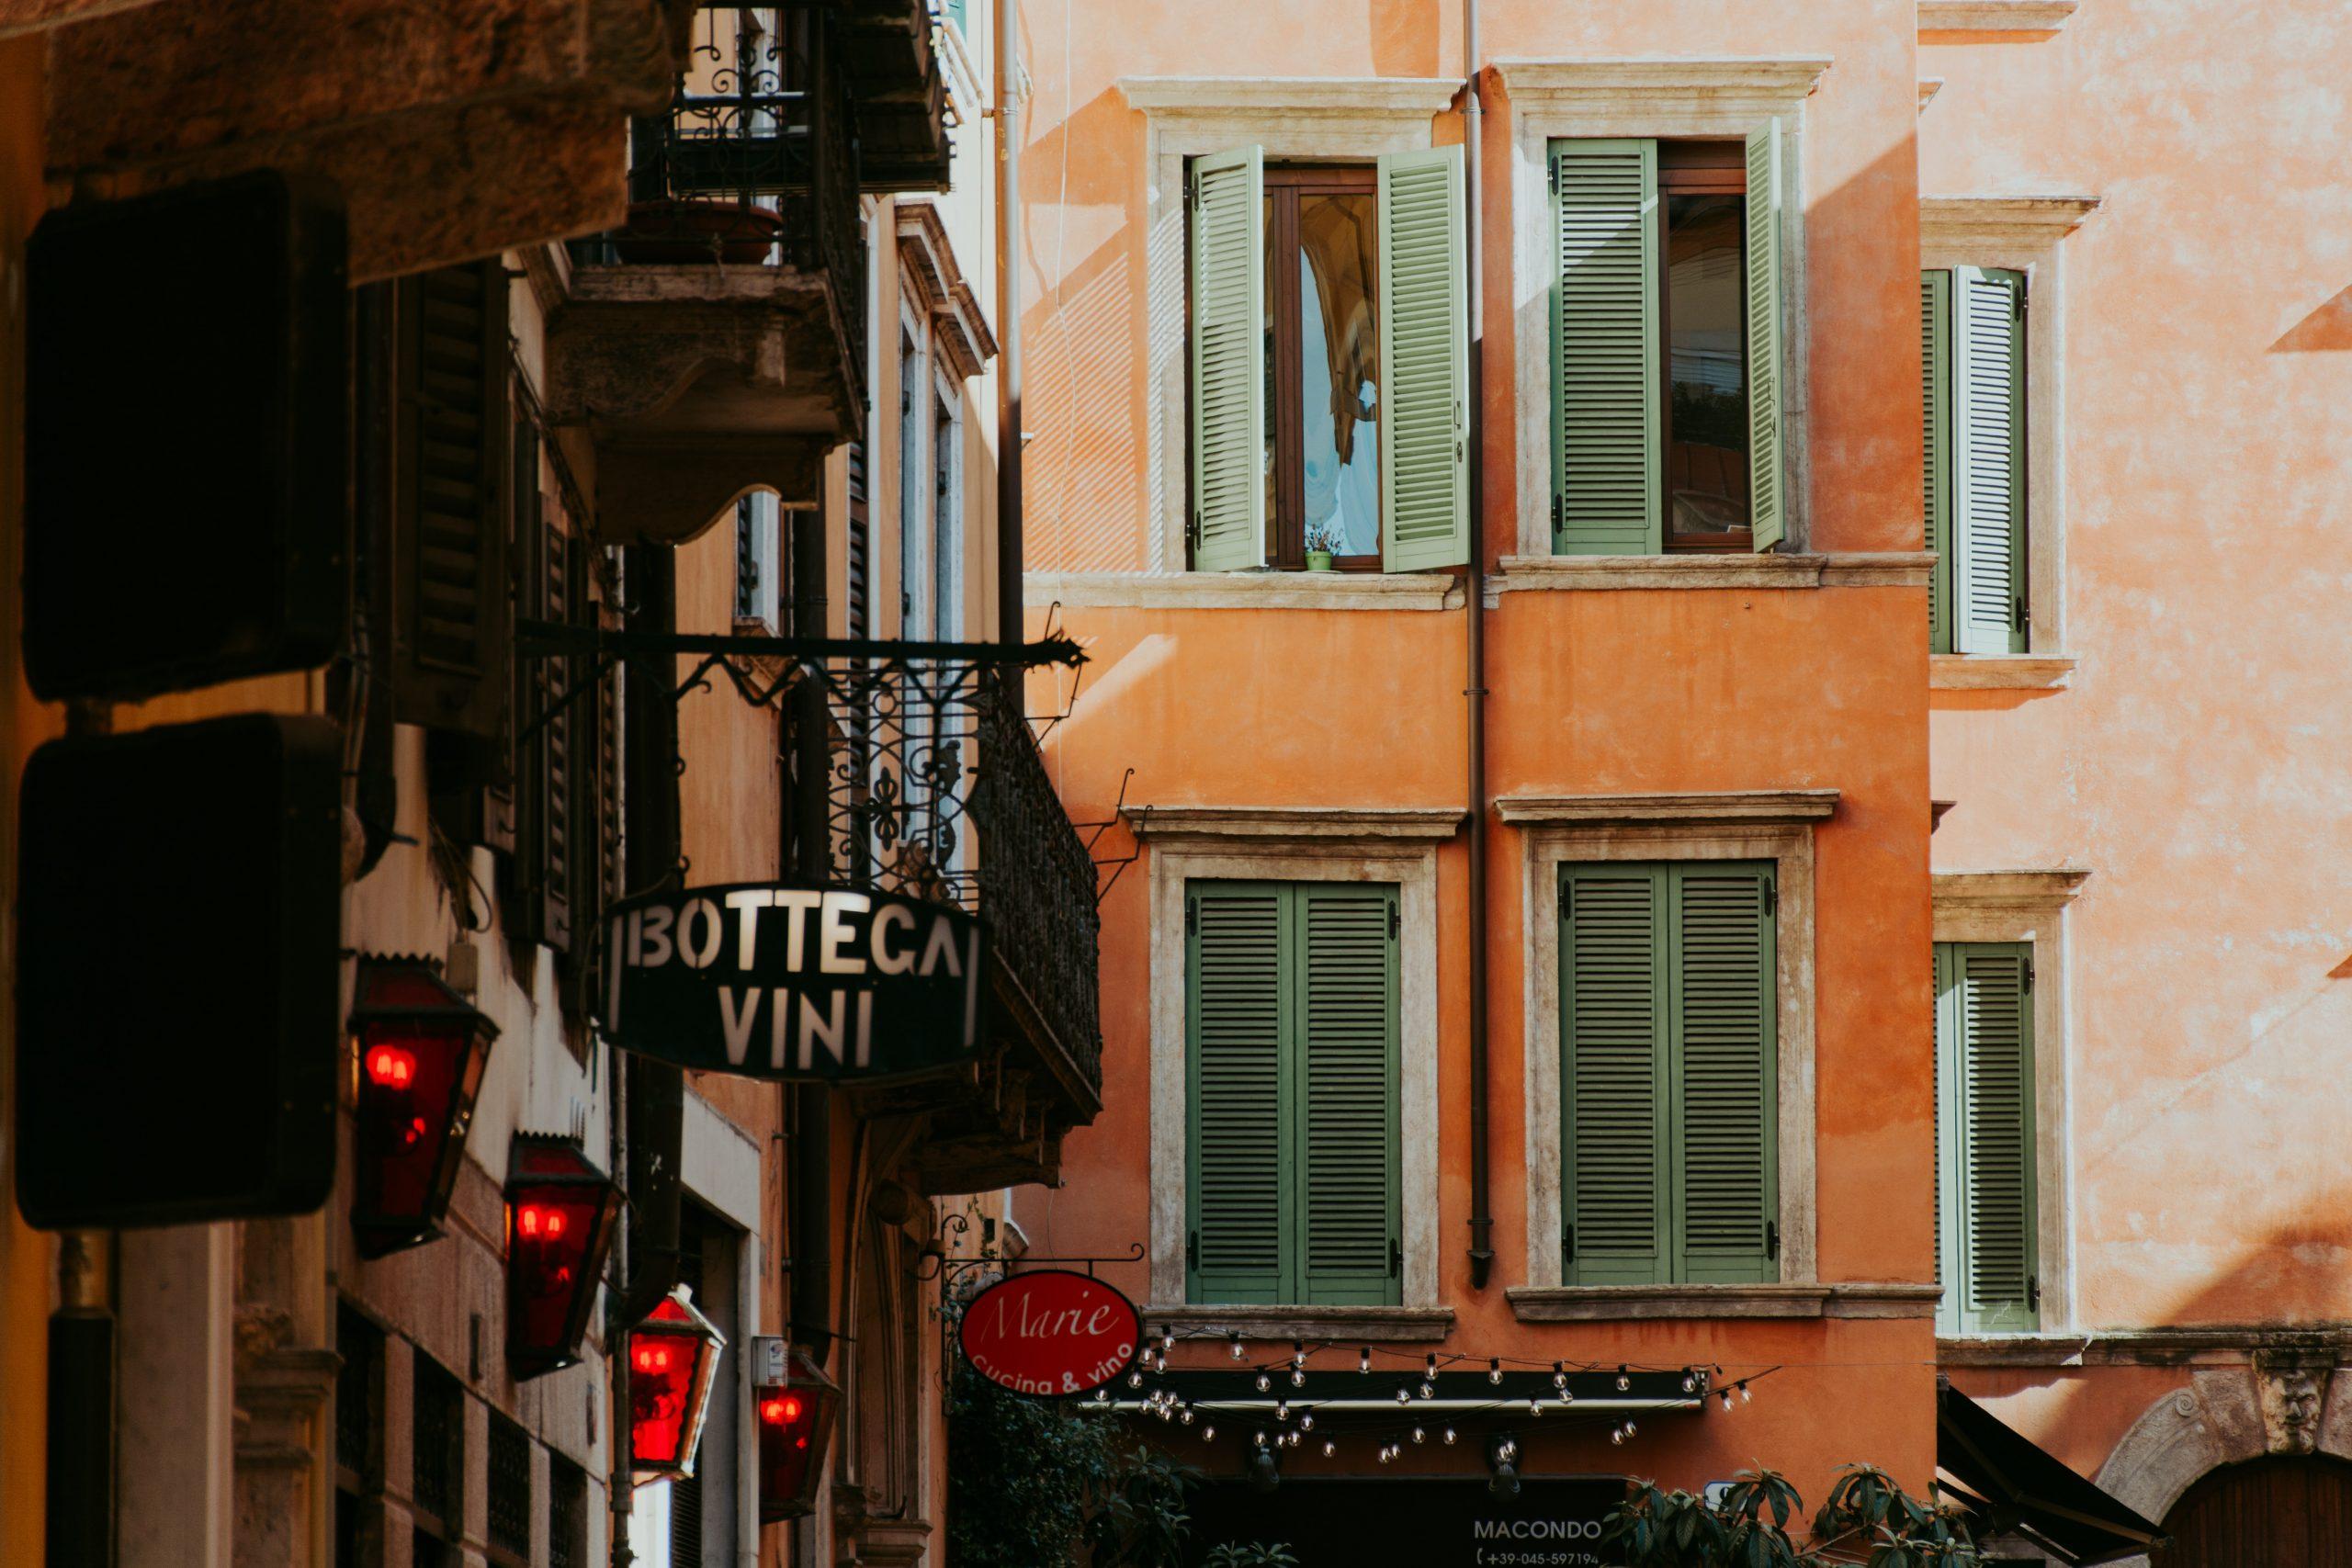 How to speak politely in Italian: TU/LEI